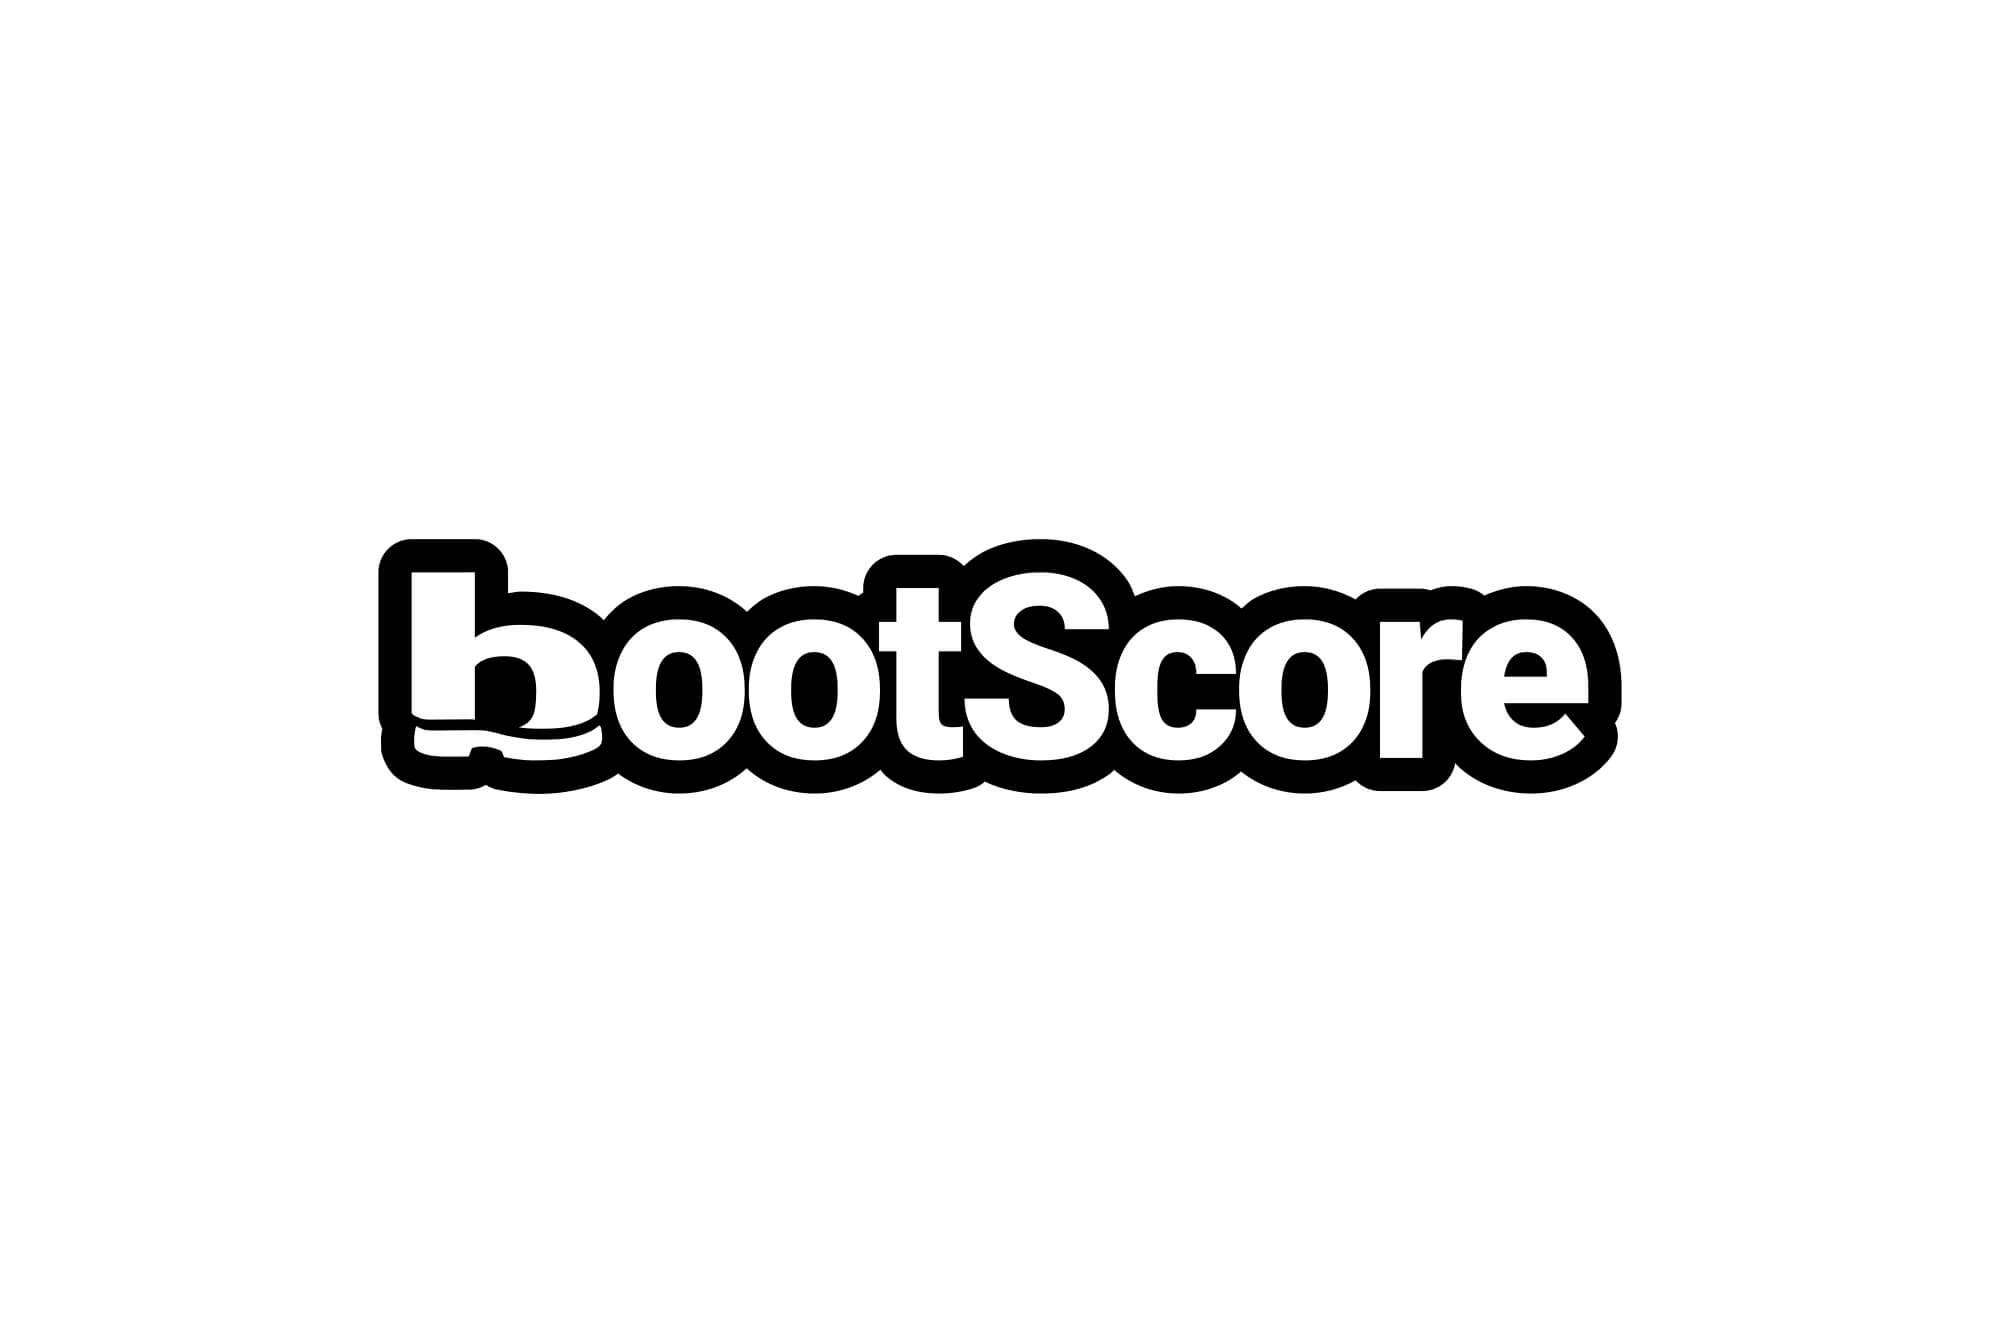 bootscore logo